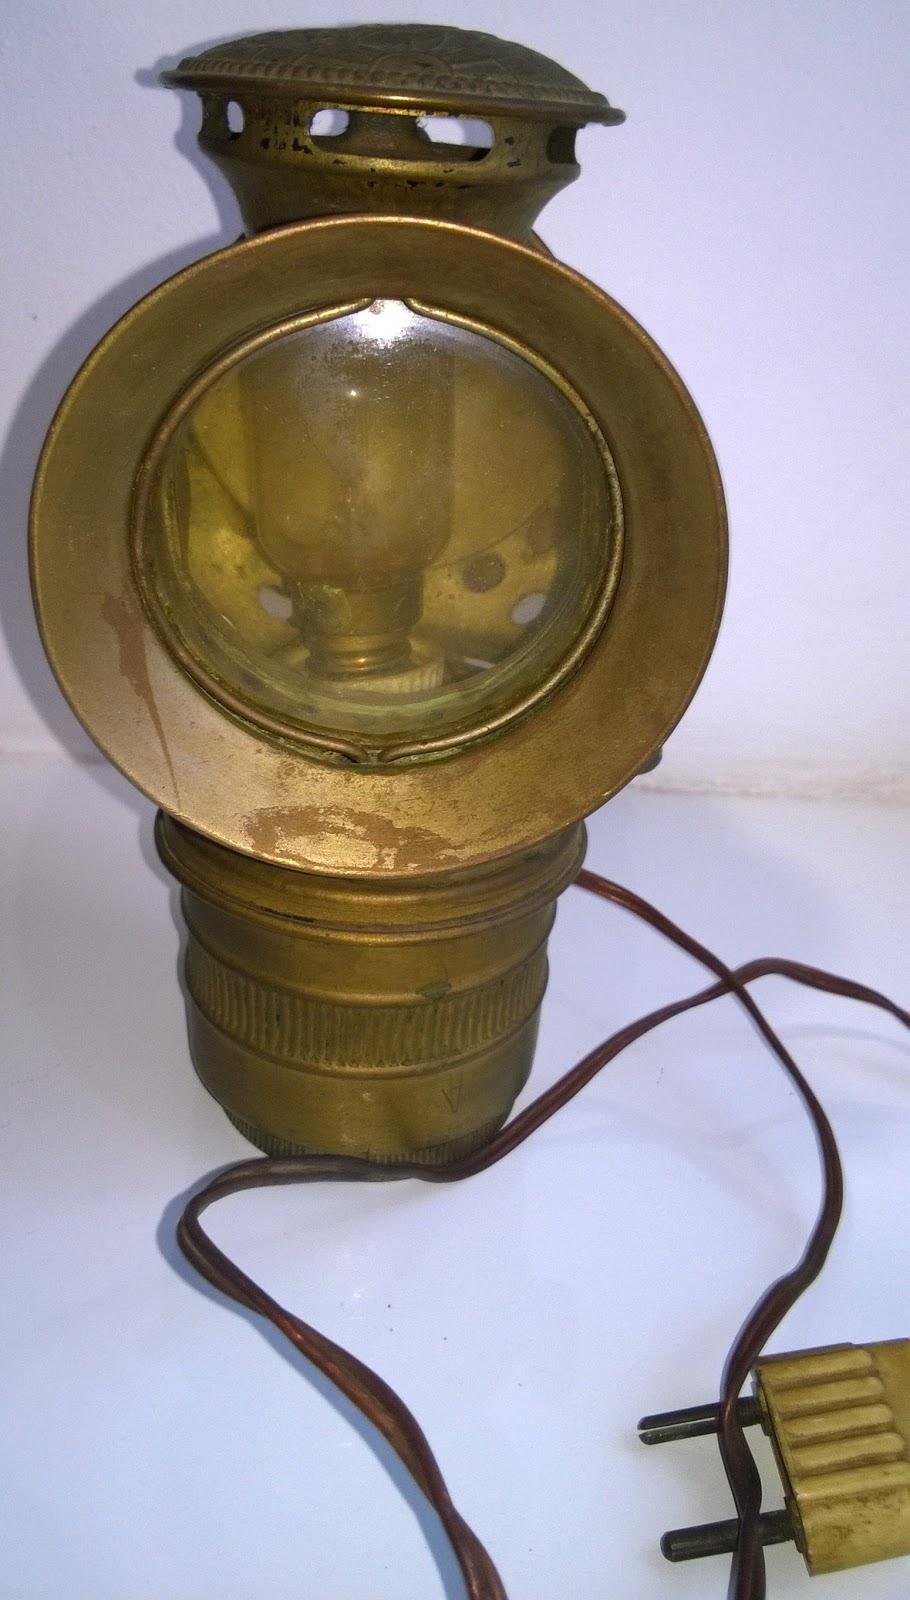 фото карбидного фонаря сочетании